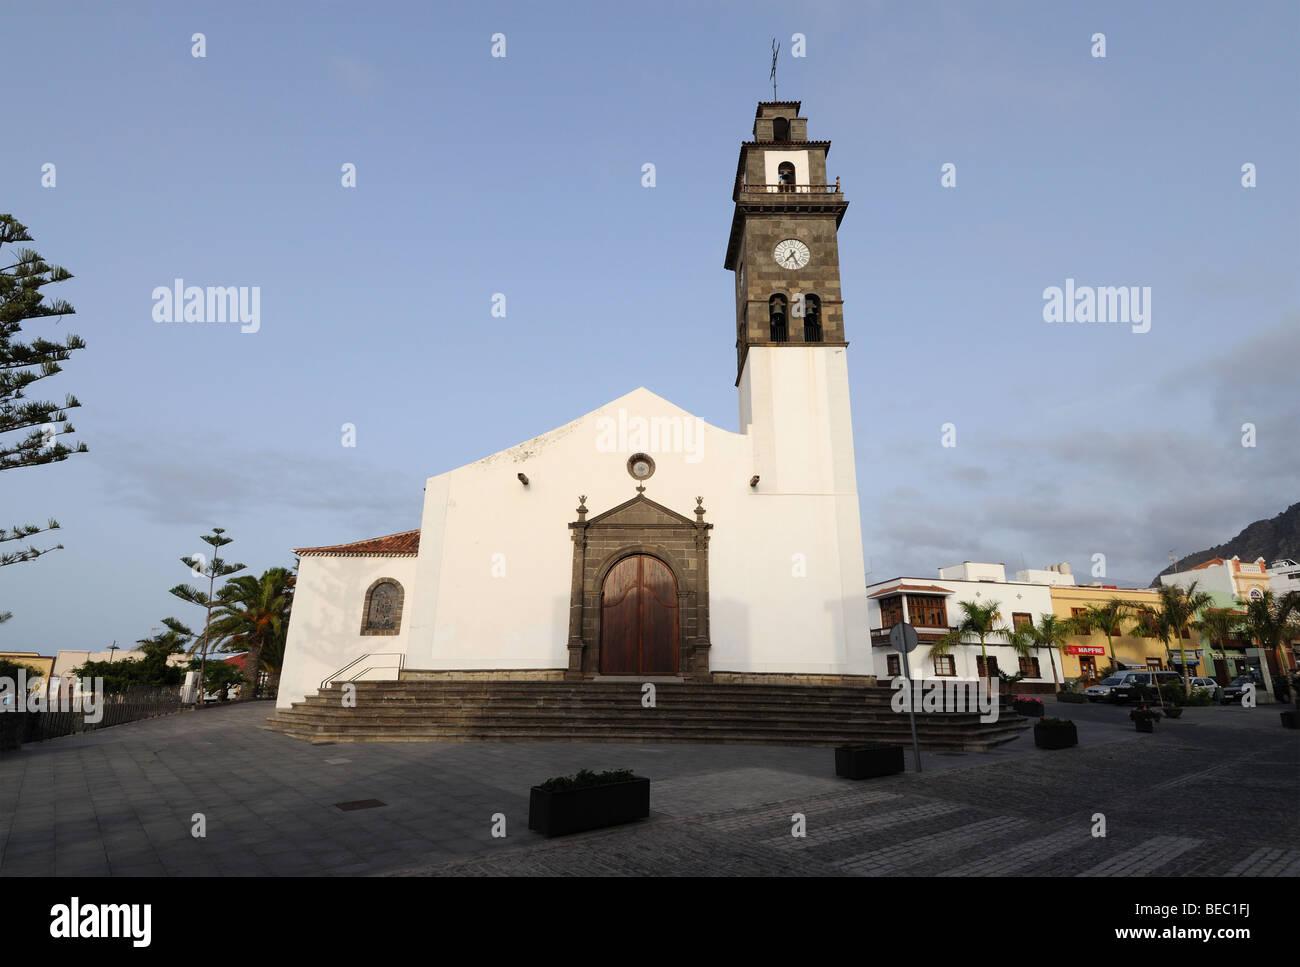 Kirche in Buenavista del Norte, Kanarische Inseln-Teneriffa, Spanien Stockfoto